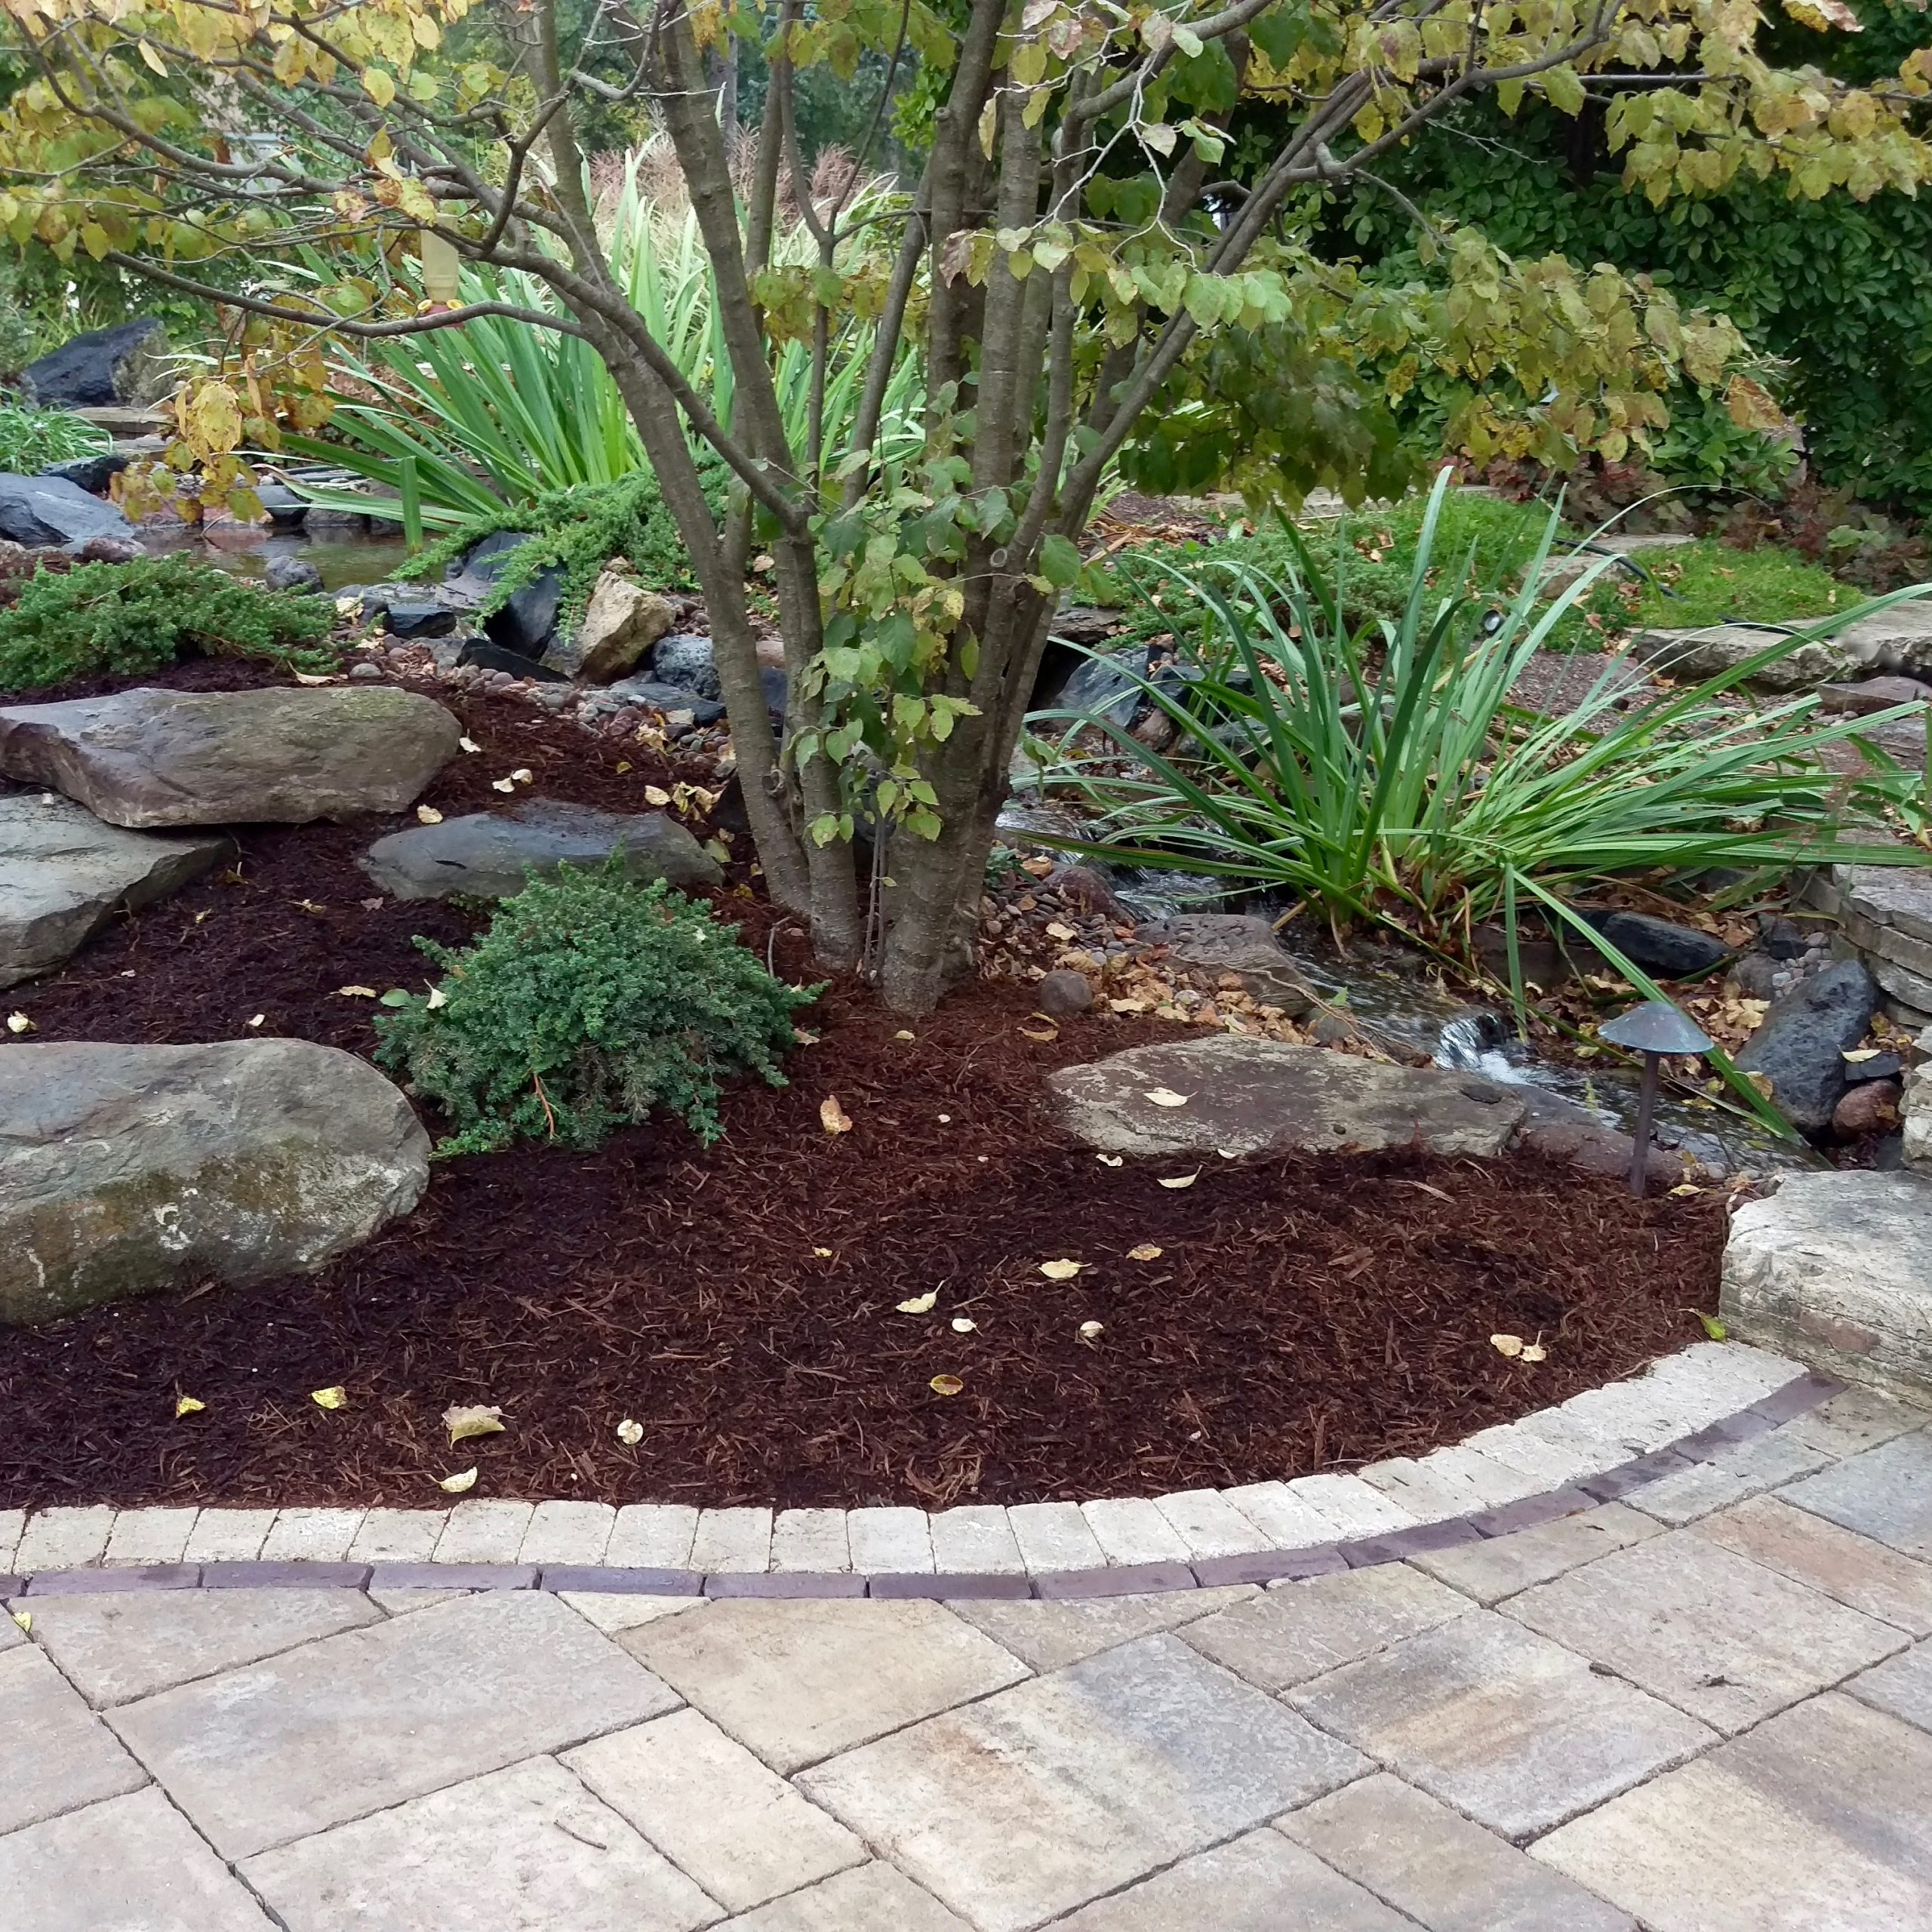 How Memorial Gardens Bring Healing (View 20 of 30)